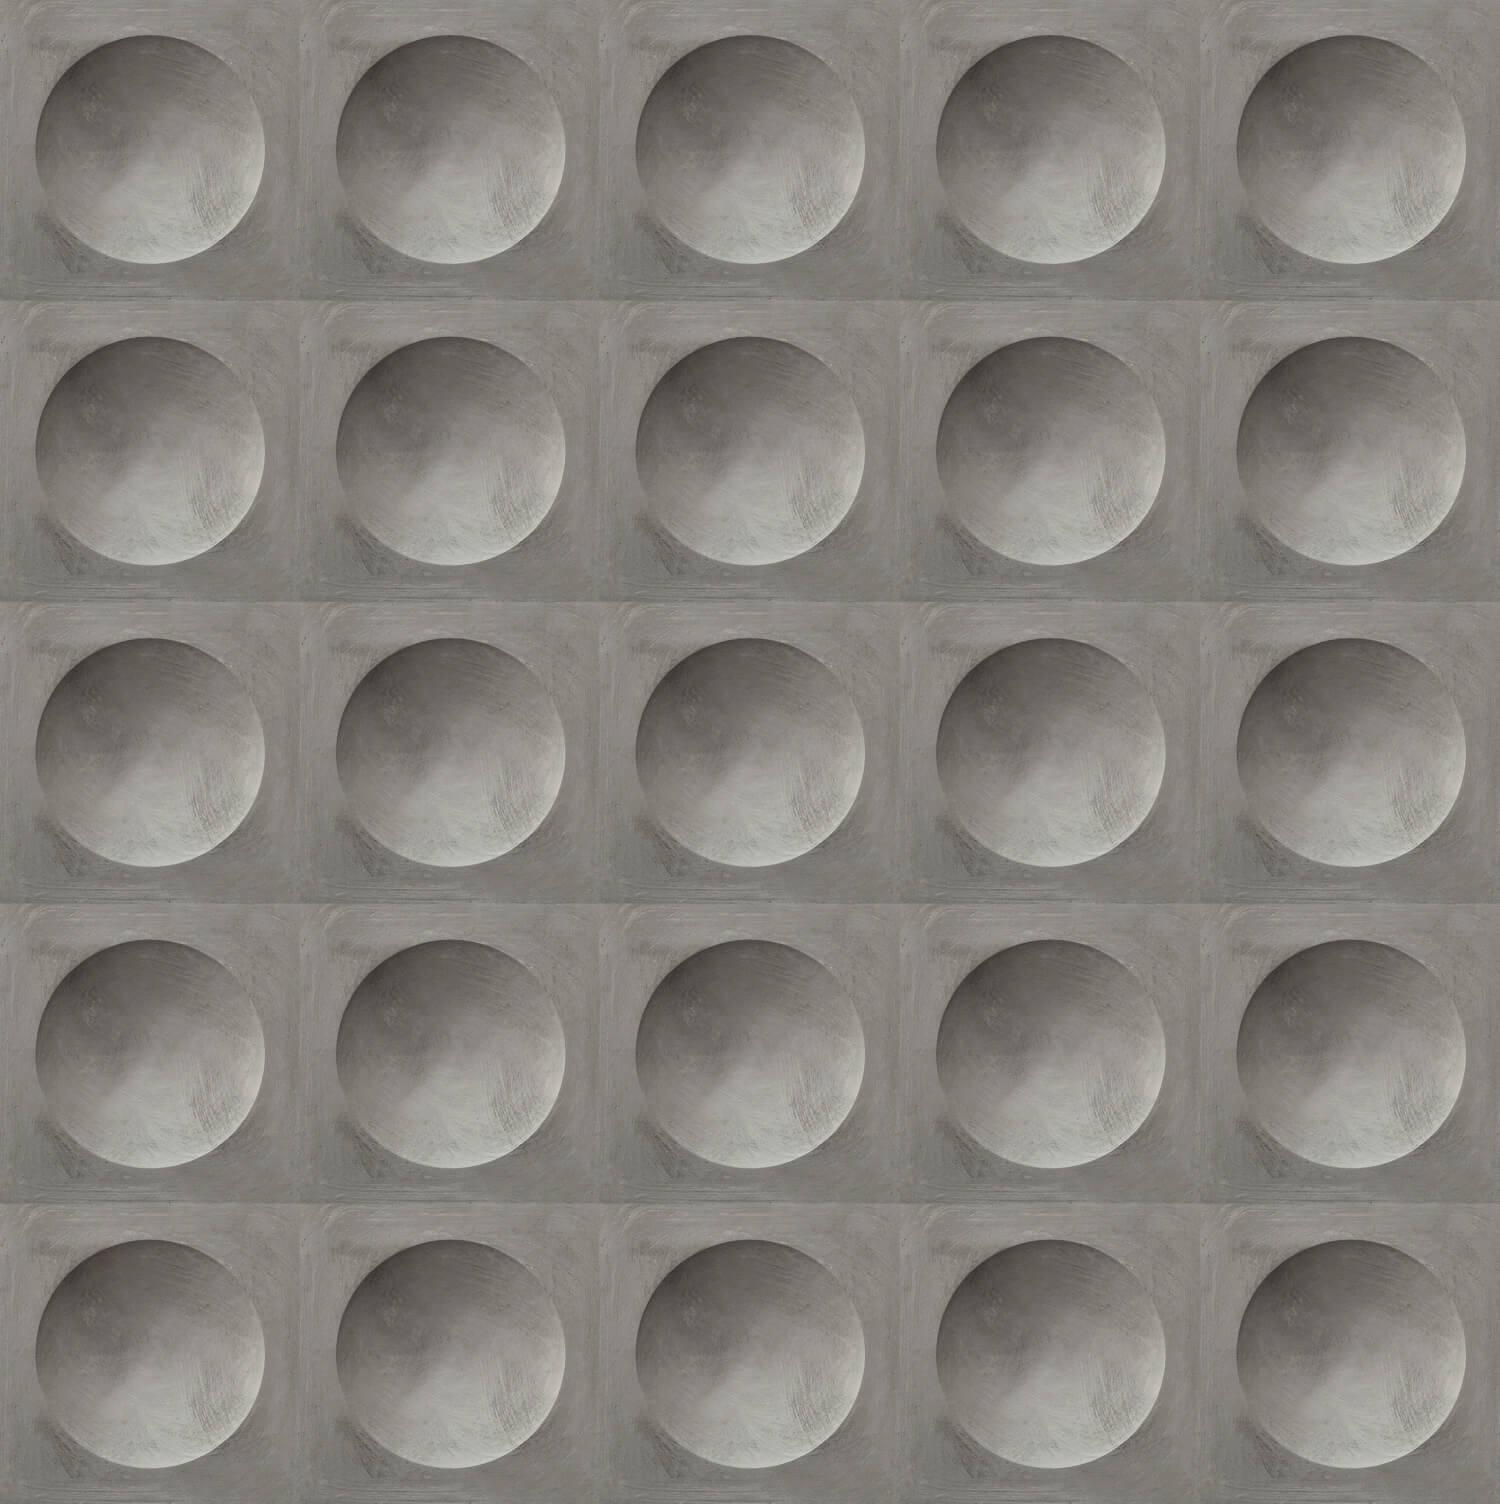 Plaster_studio_tile_sq_04_concrete